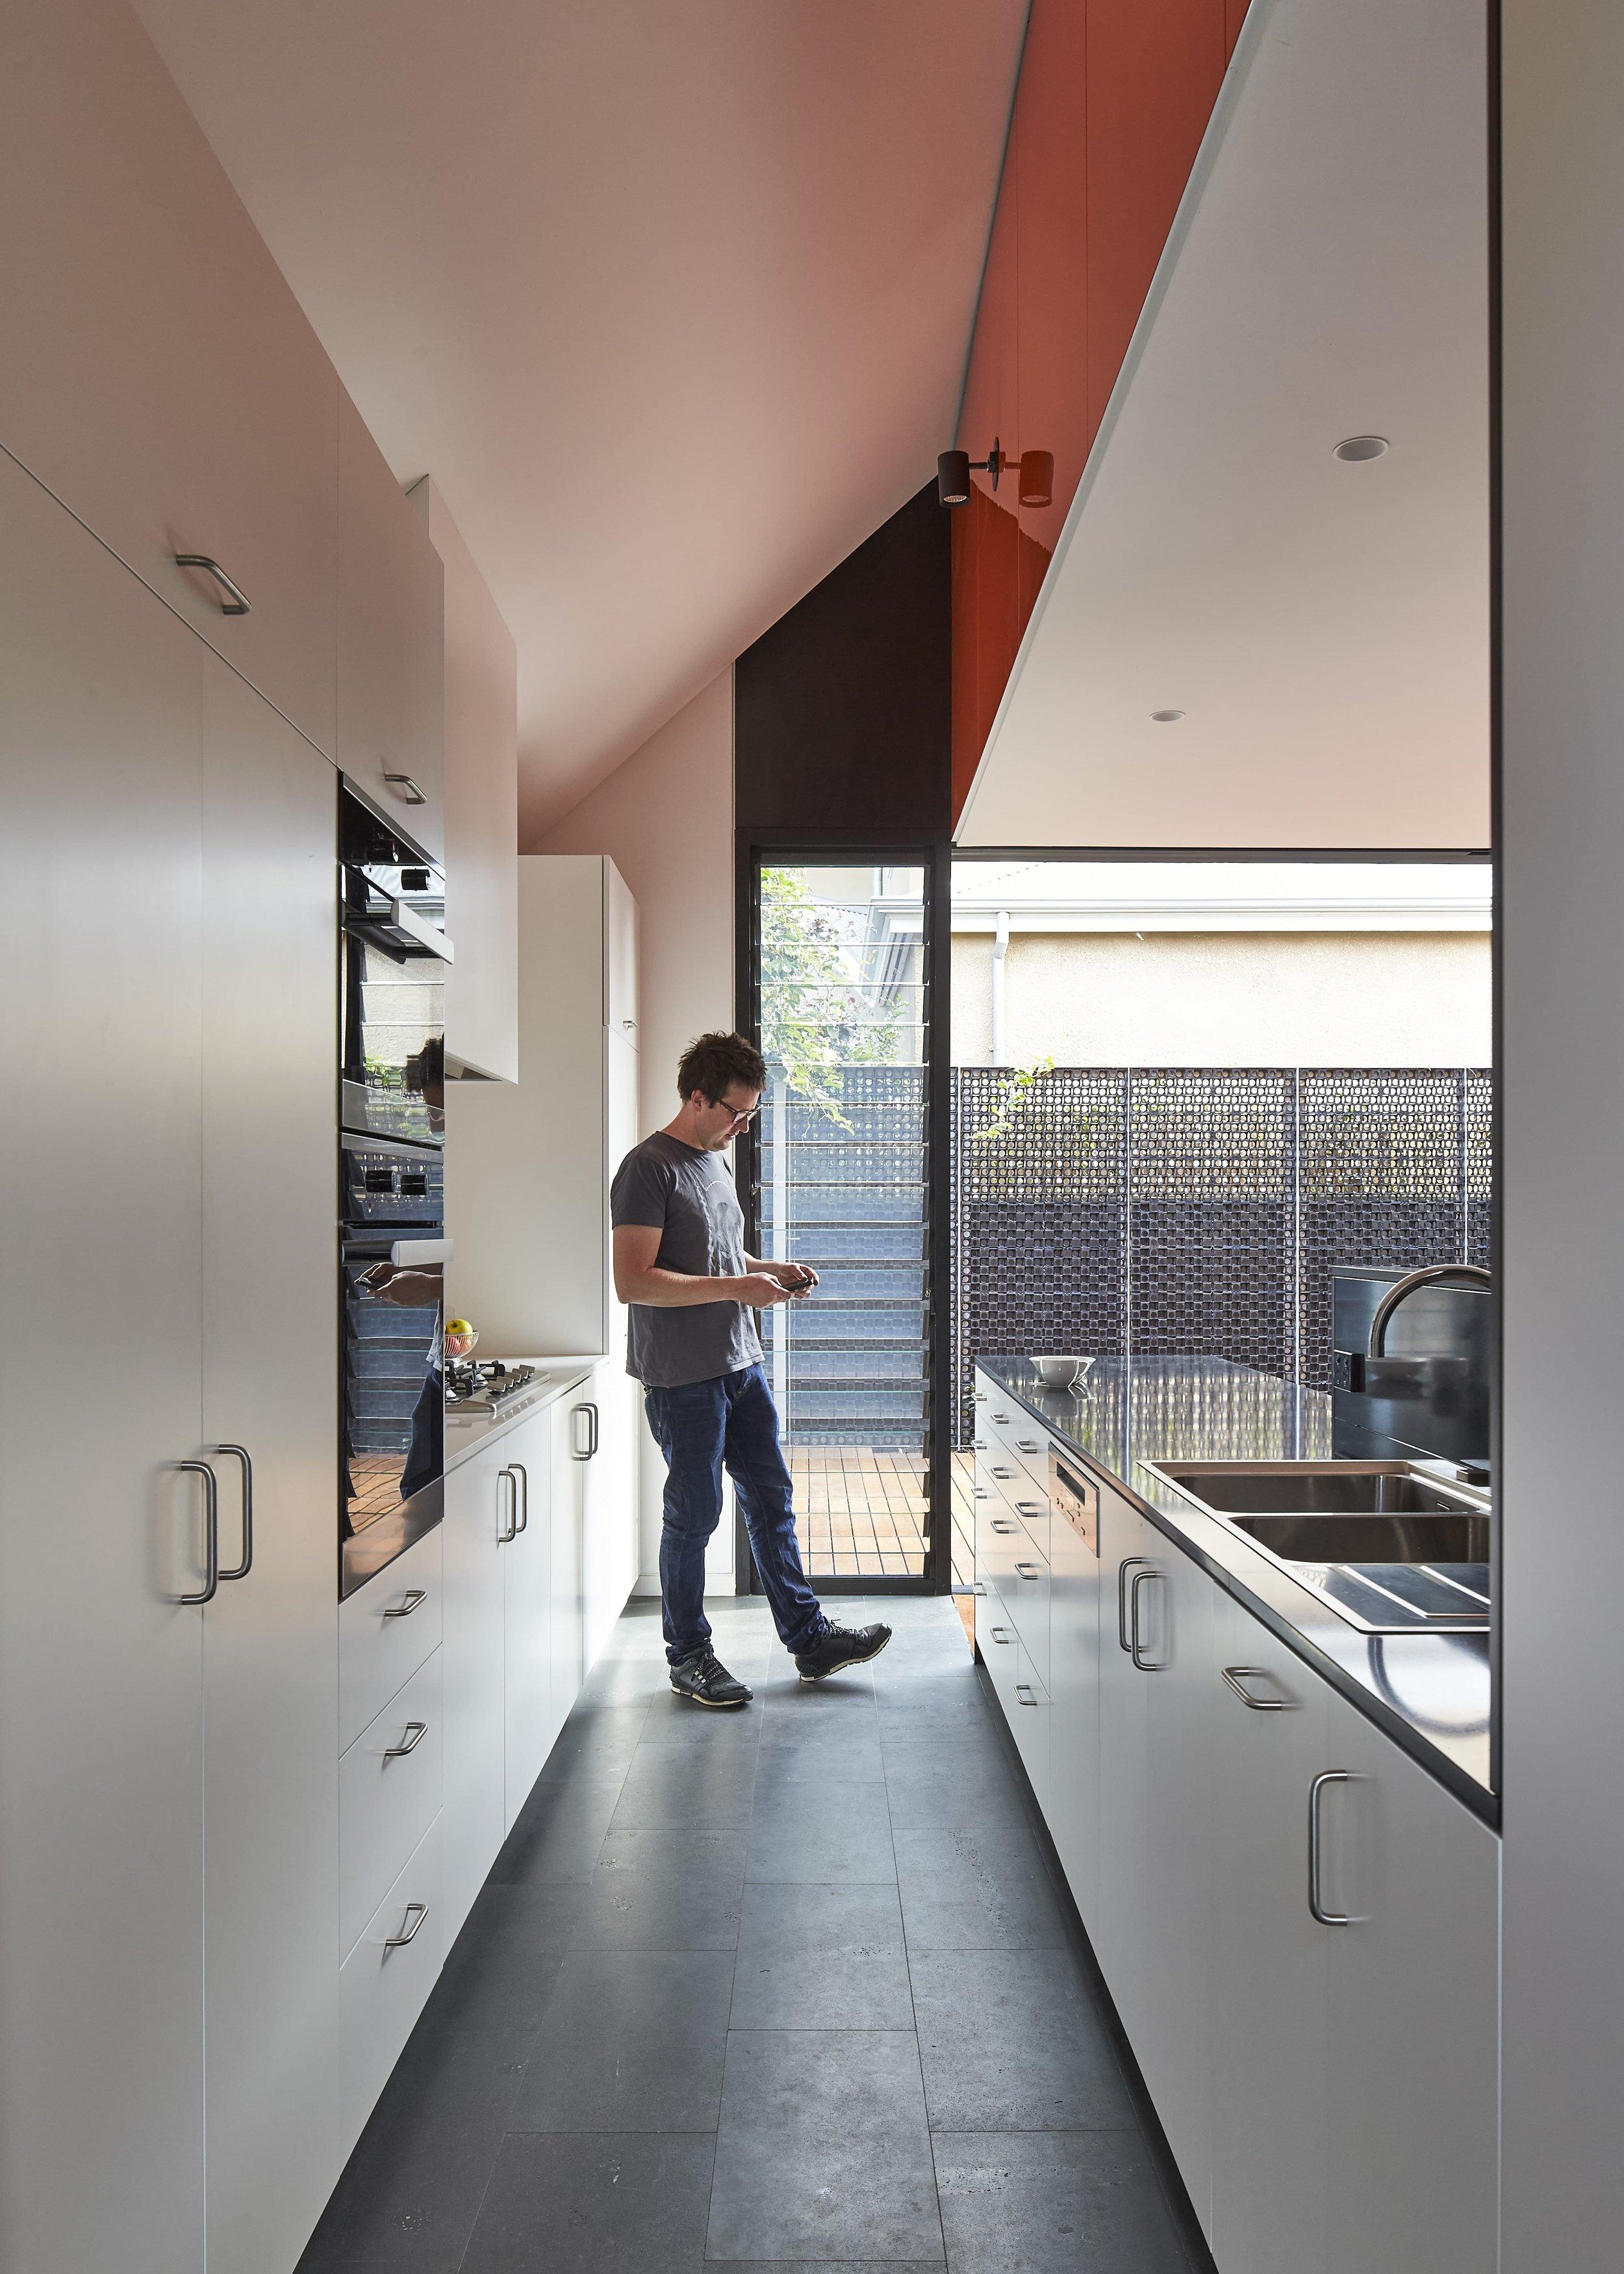 Bosske_Camino_House_Kitchen2.jpg